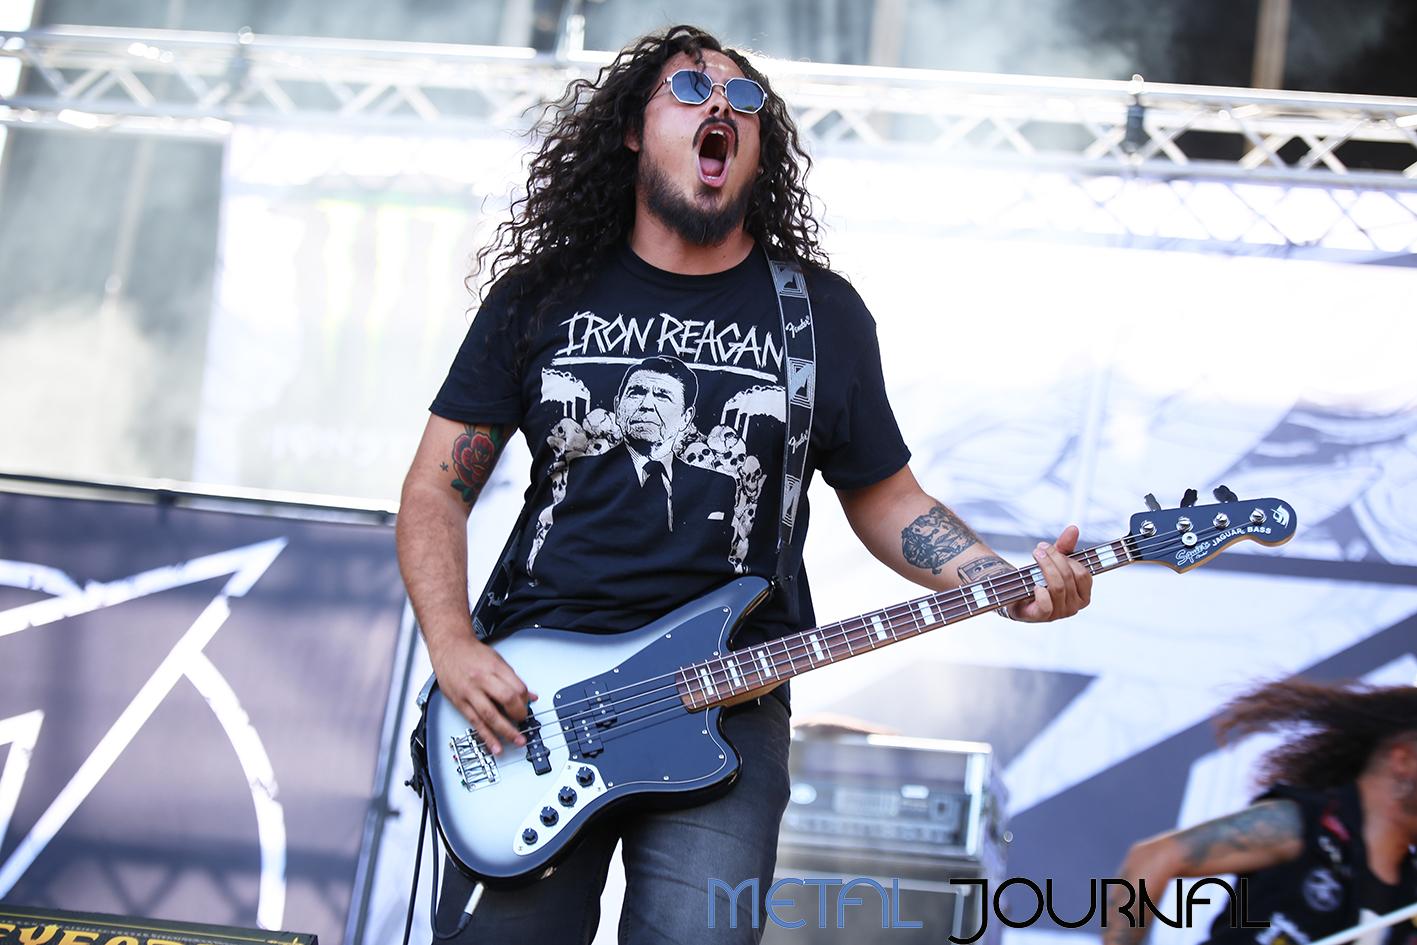 crisix - leyendas del rock 2019 metal journal pic 4